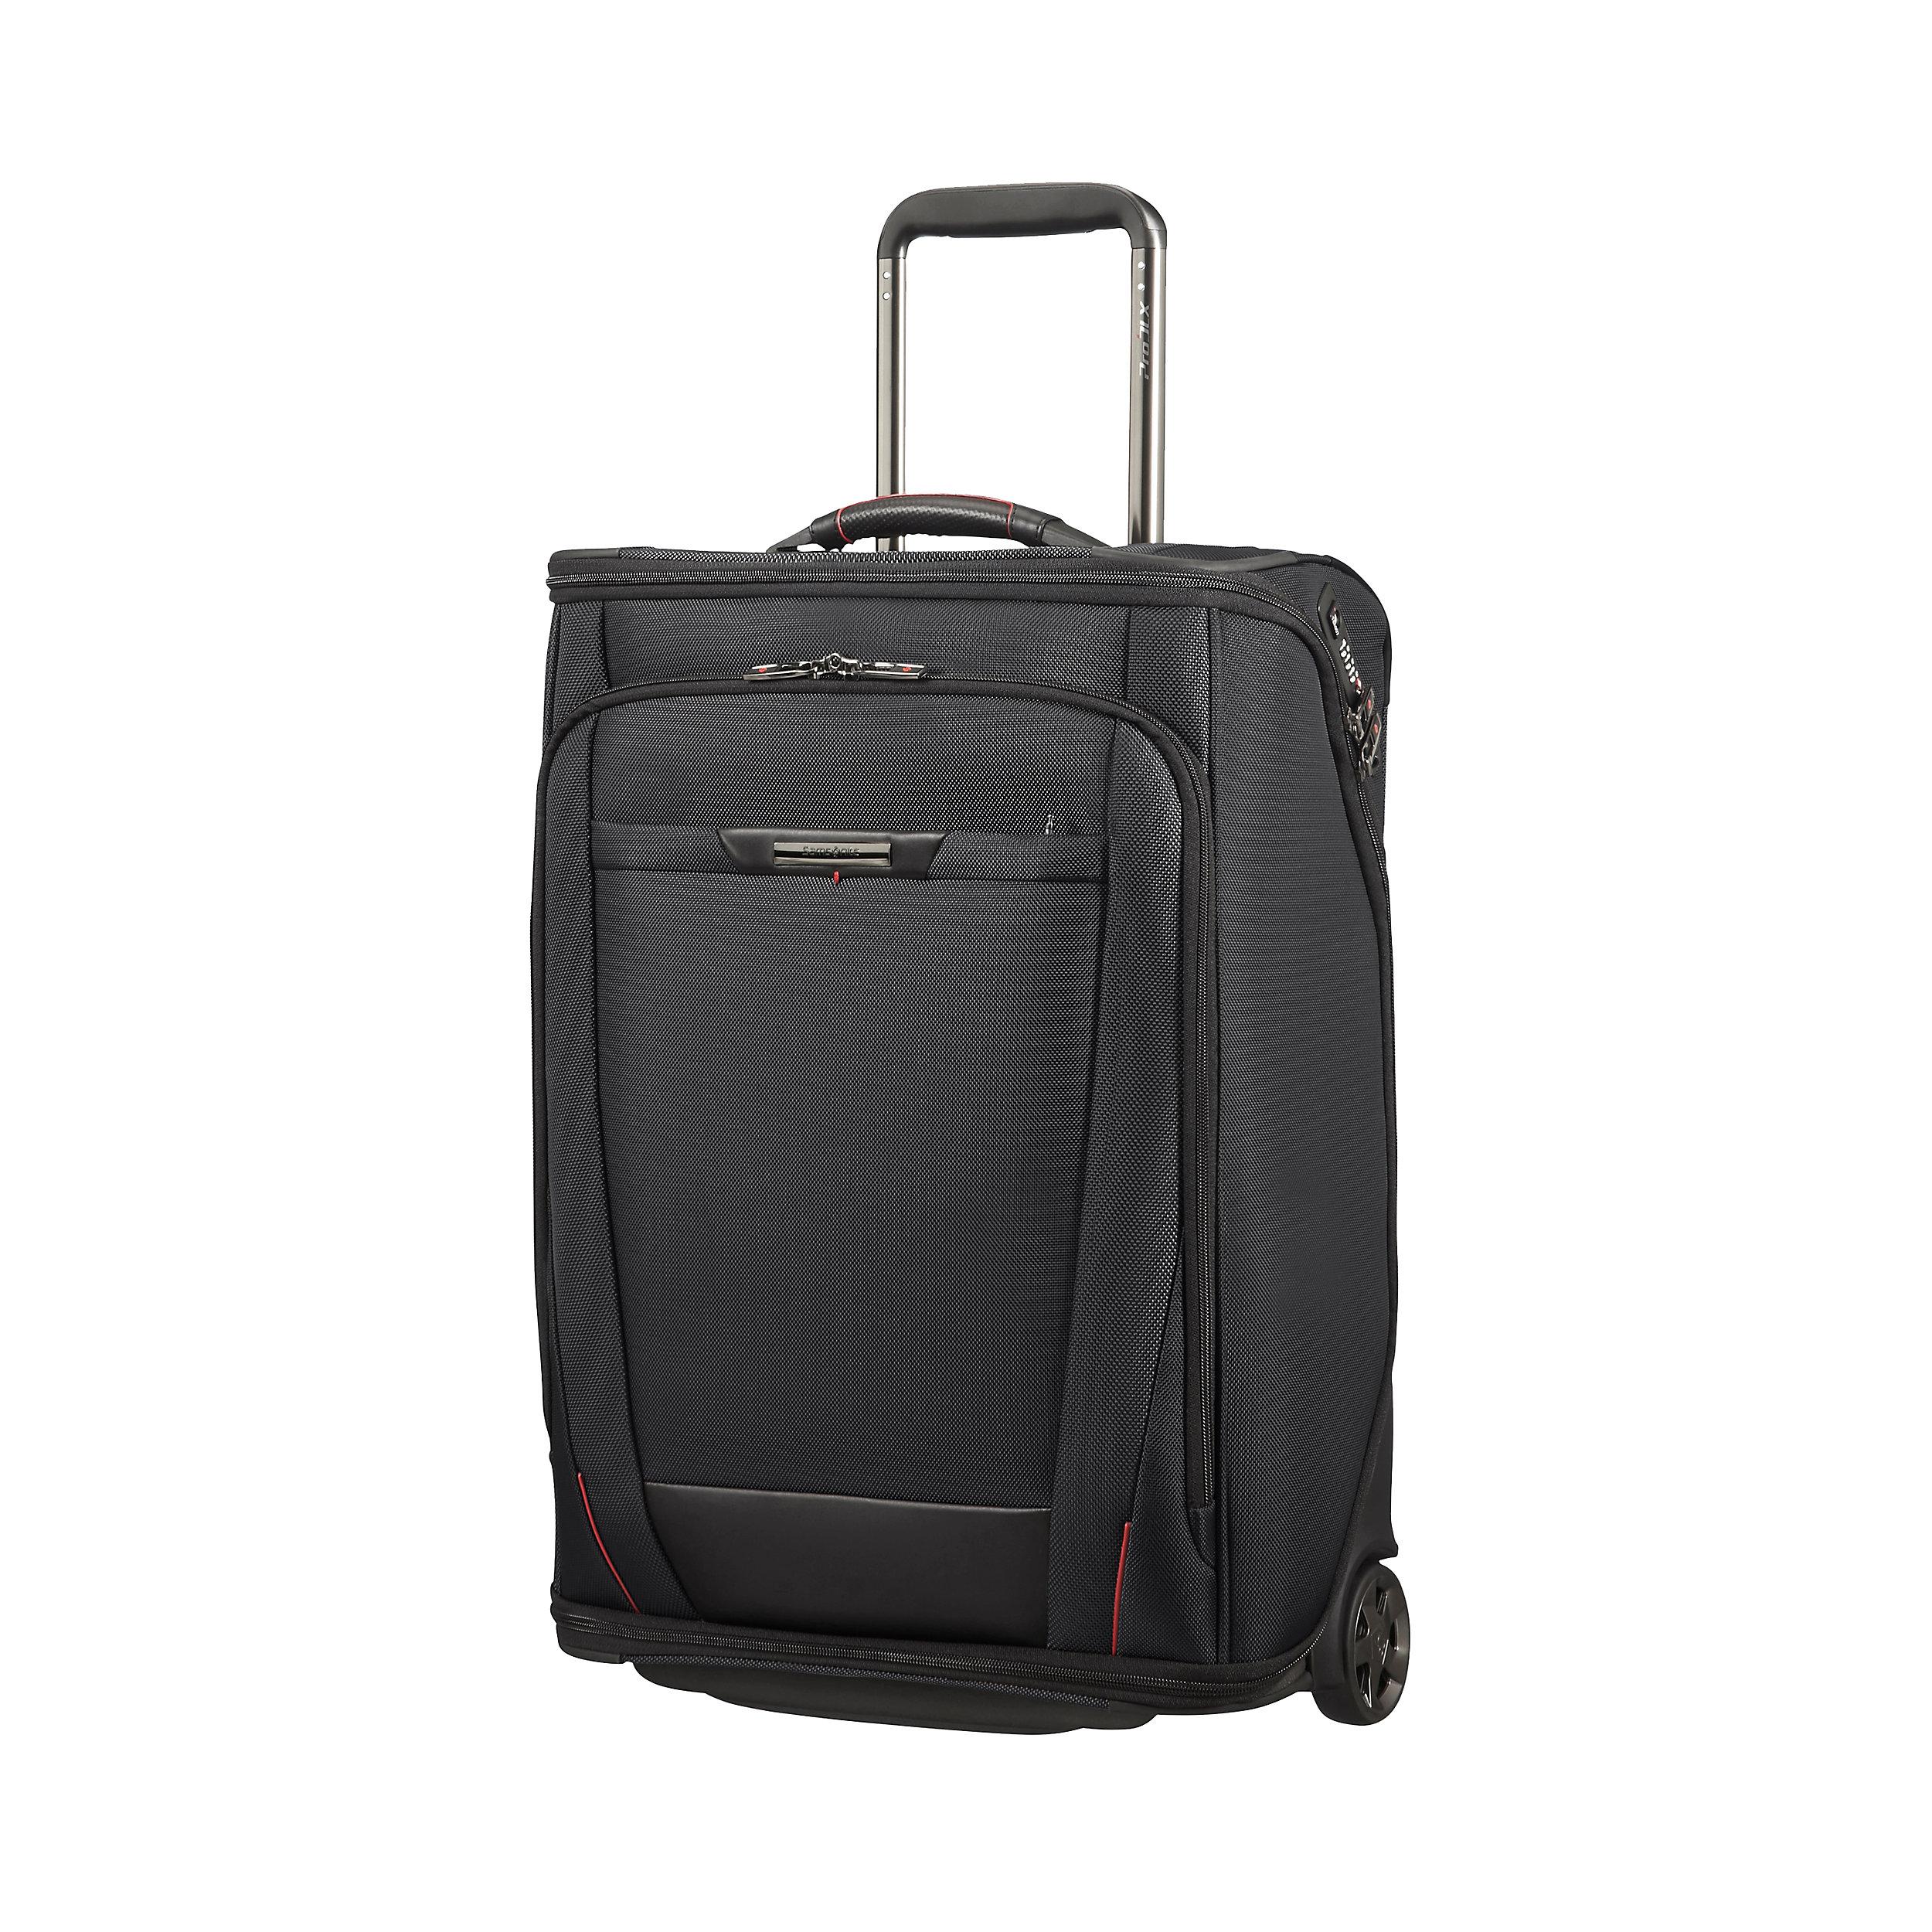 Wheeled Garment Bag with 2 wheels Cabin 55cm Pro-DLX5 S 36 Liter